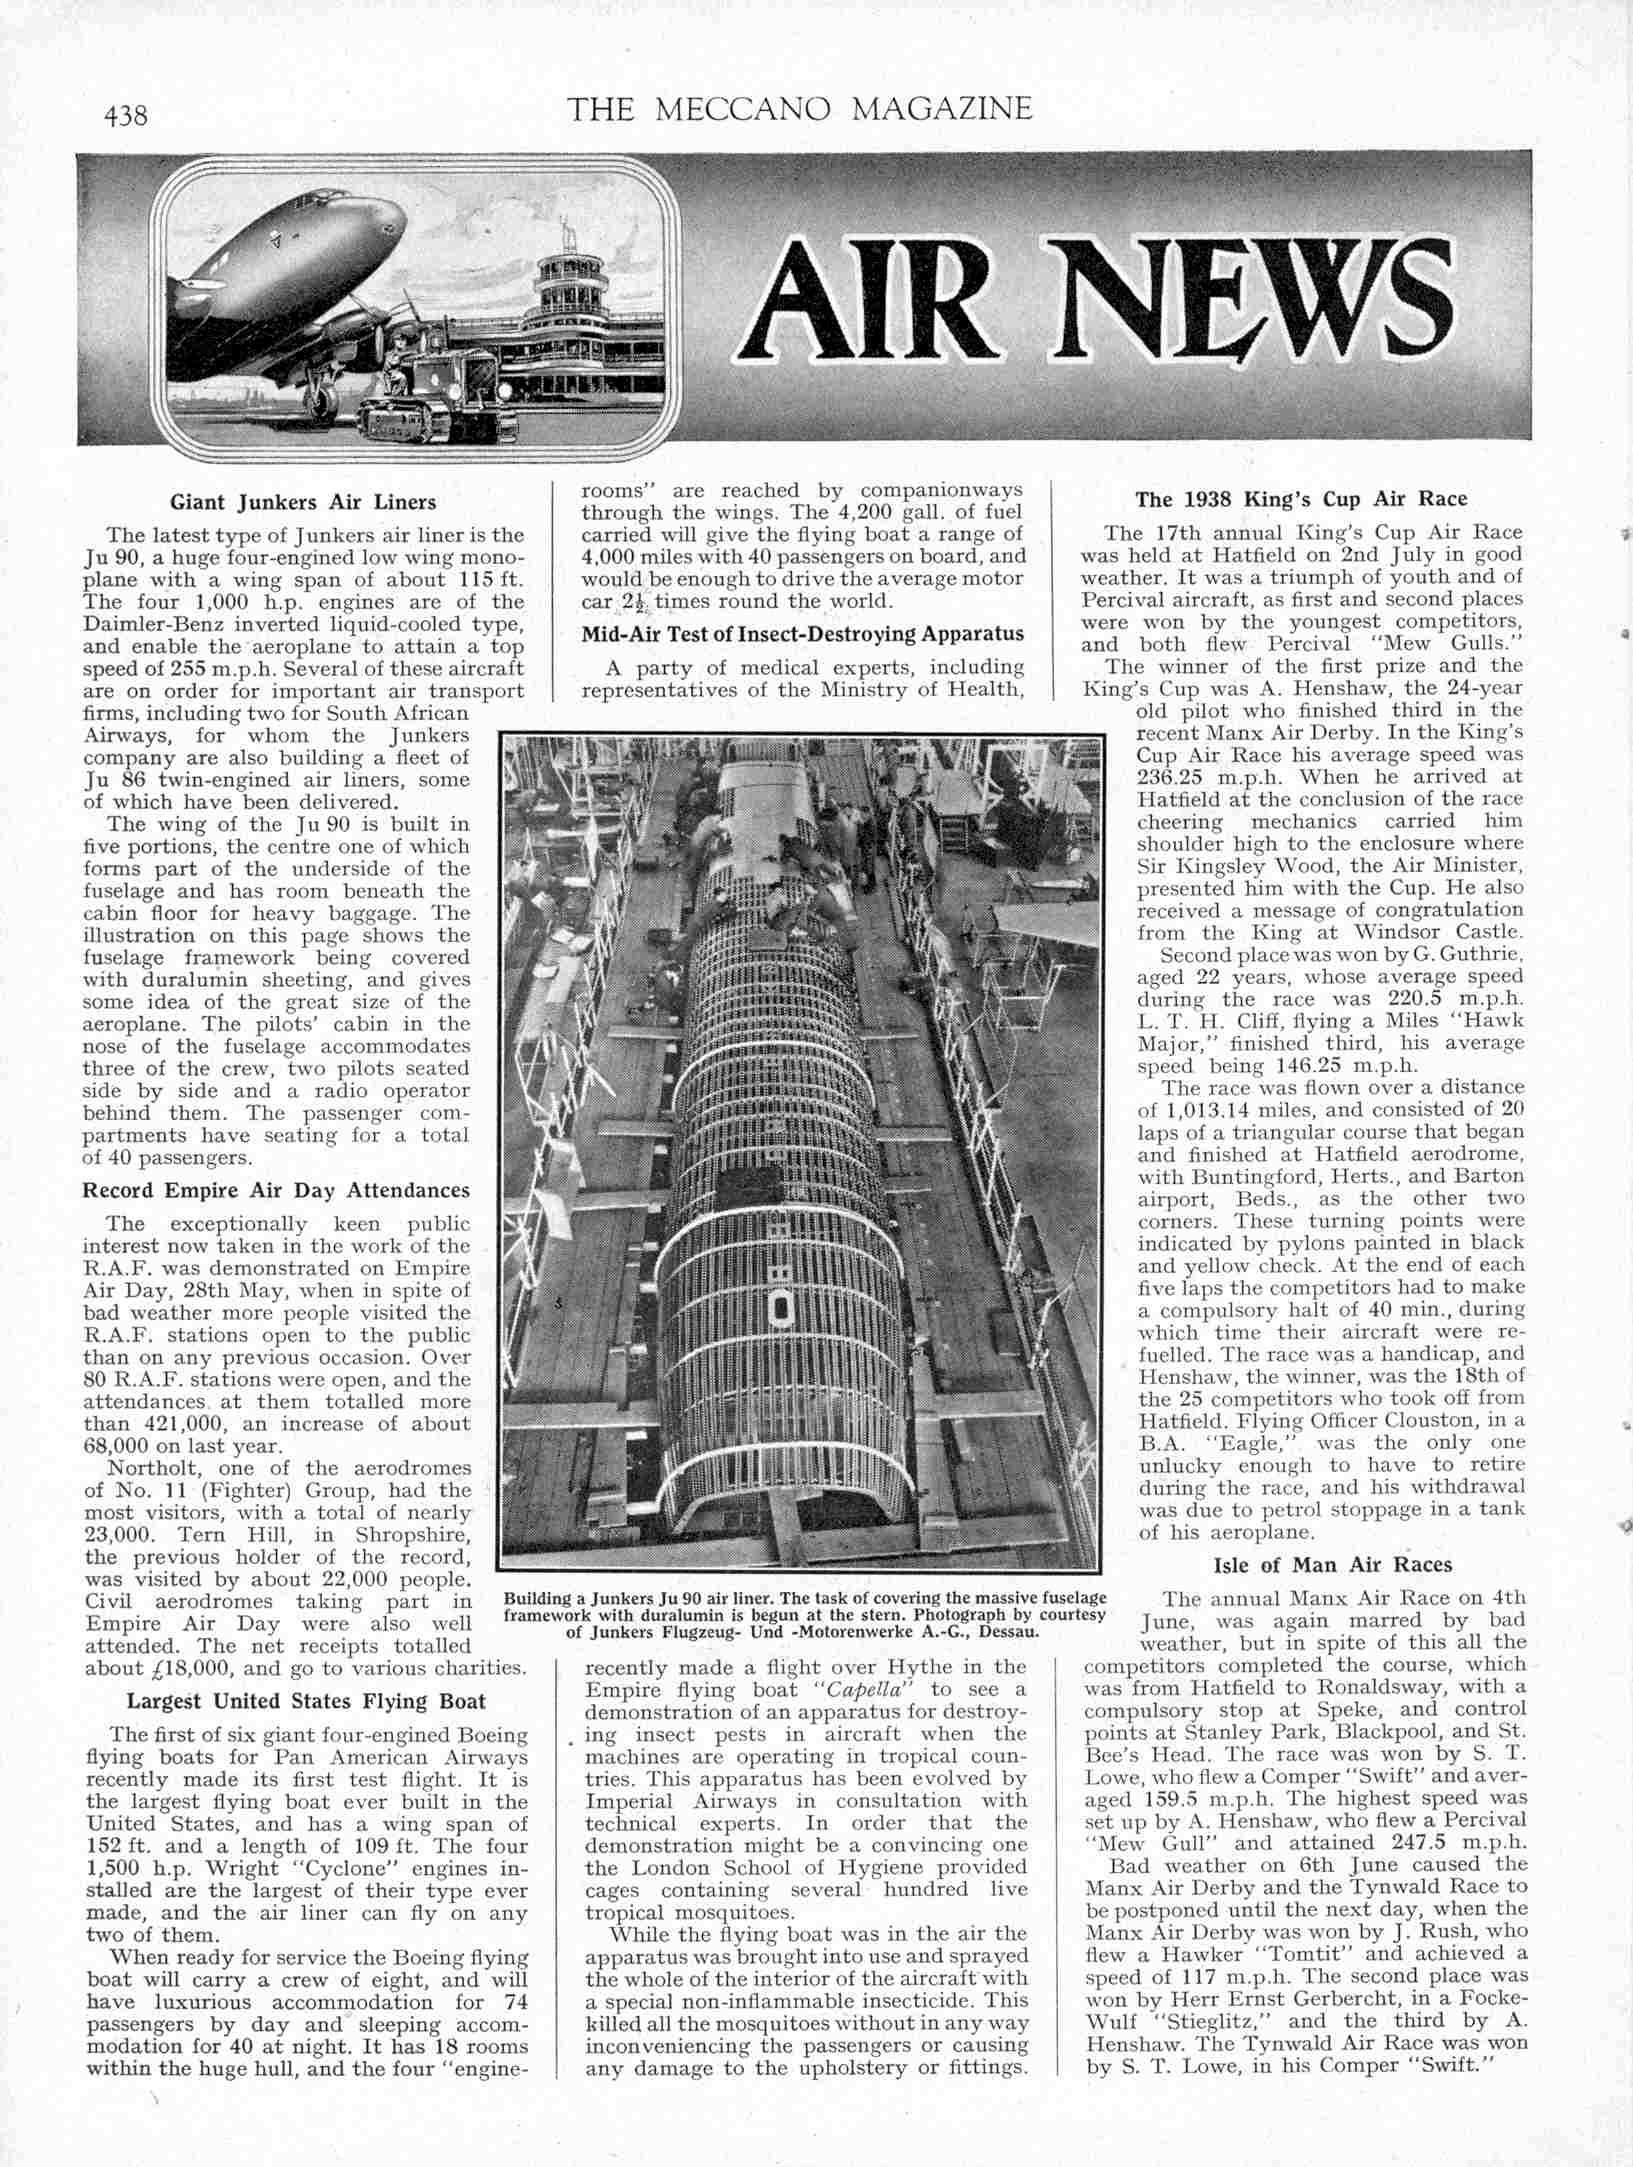 UK Meccano Magazine August 1938 Page 438